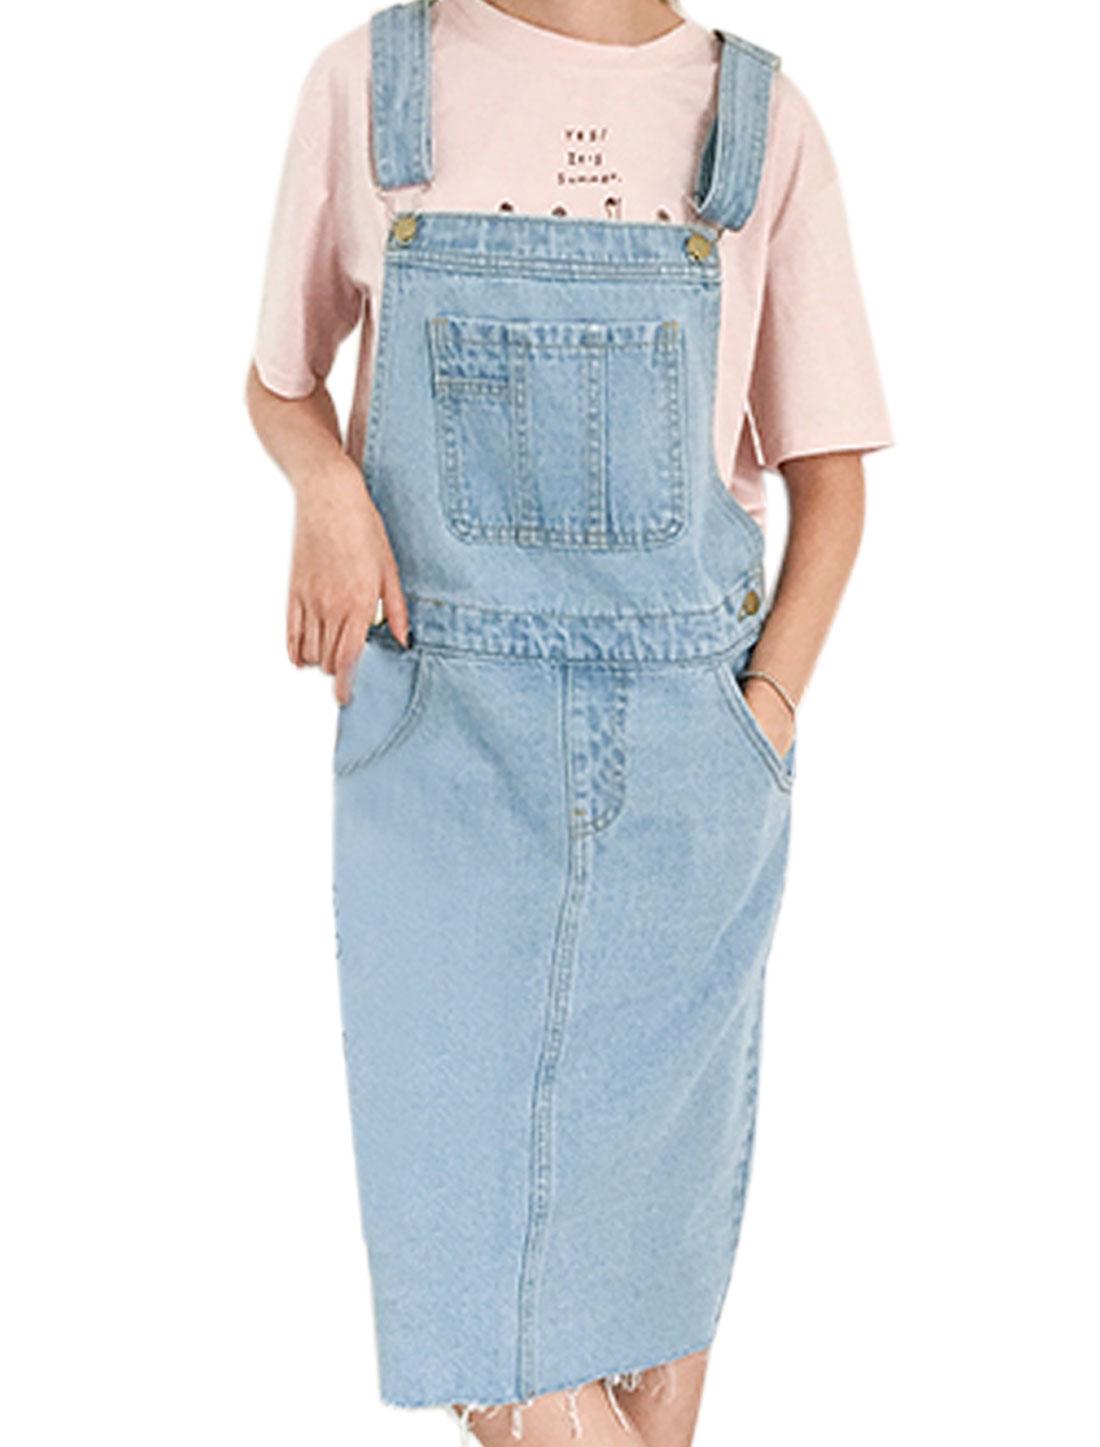 Women Mid Calf Frayed Pockes Denim Suspender Dress Blue S